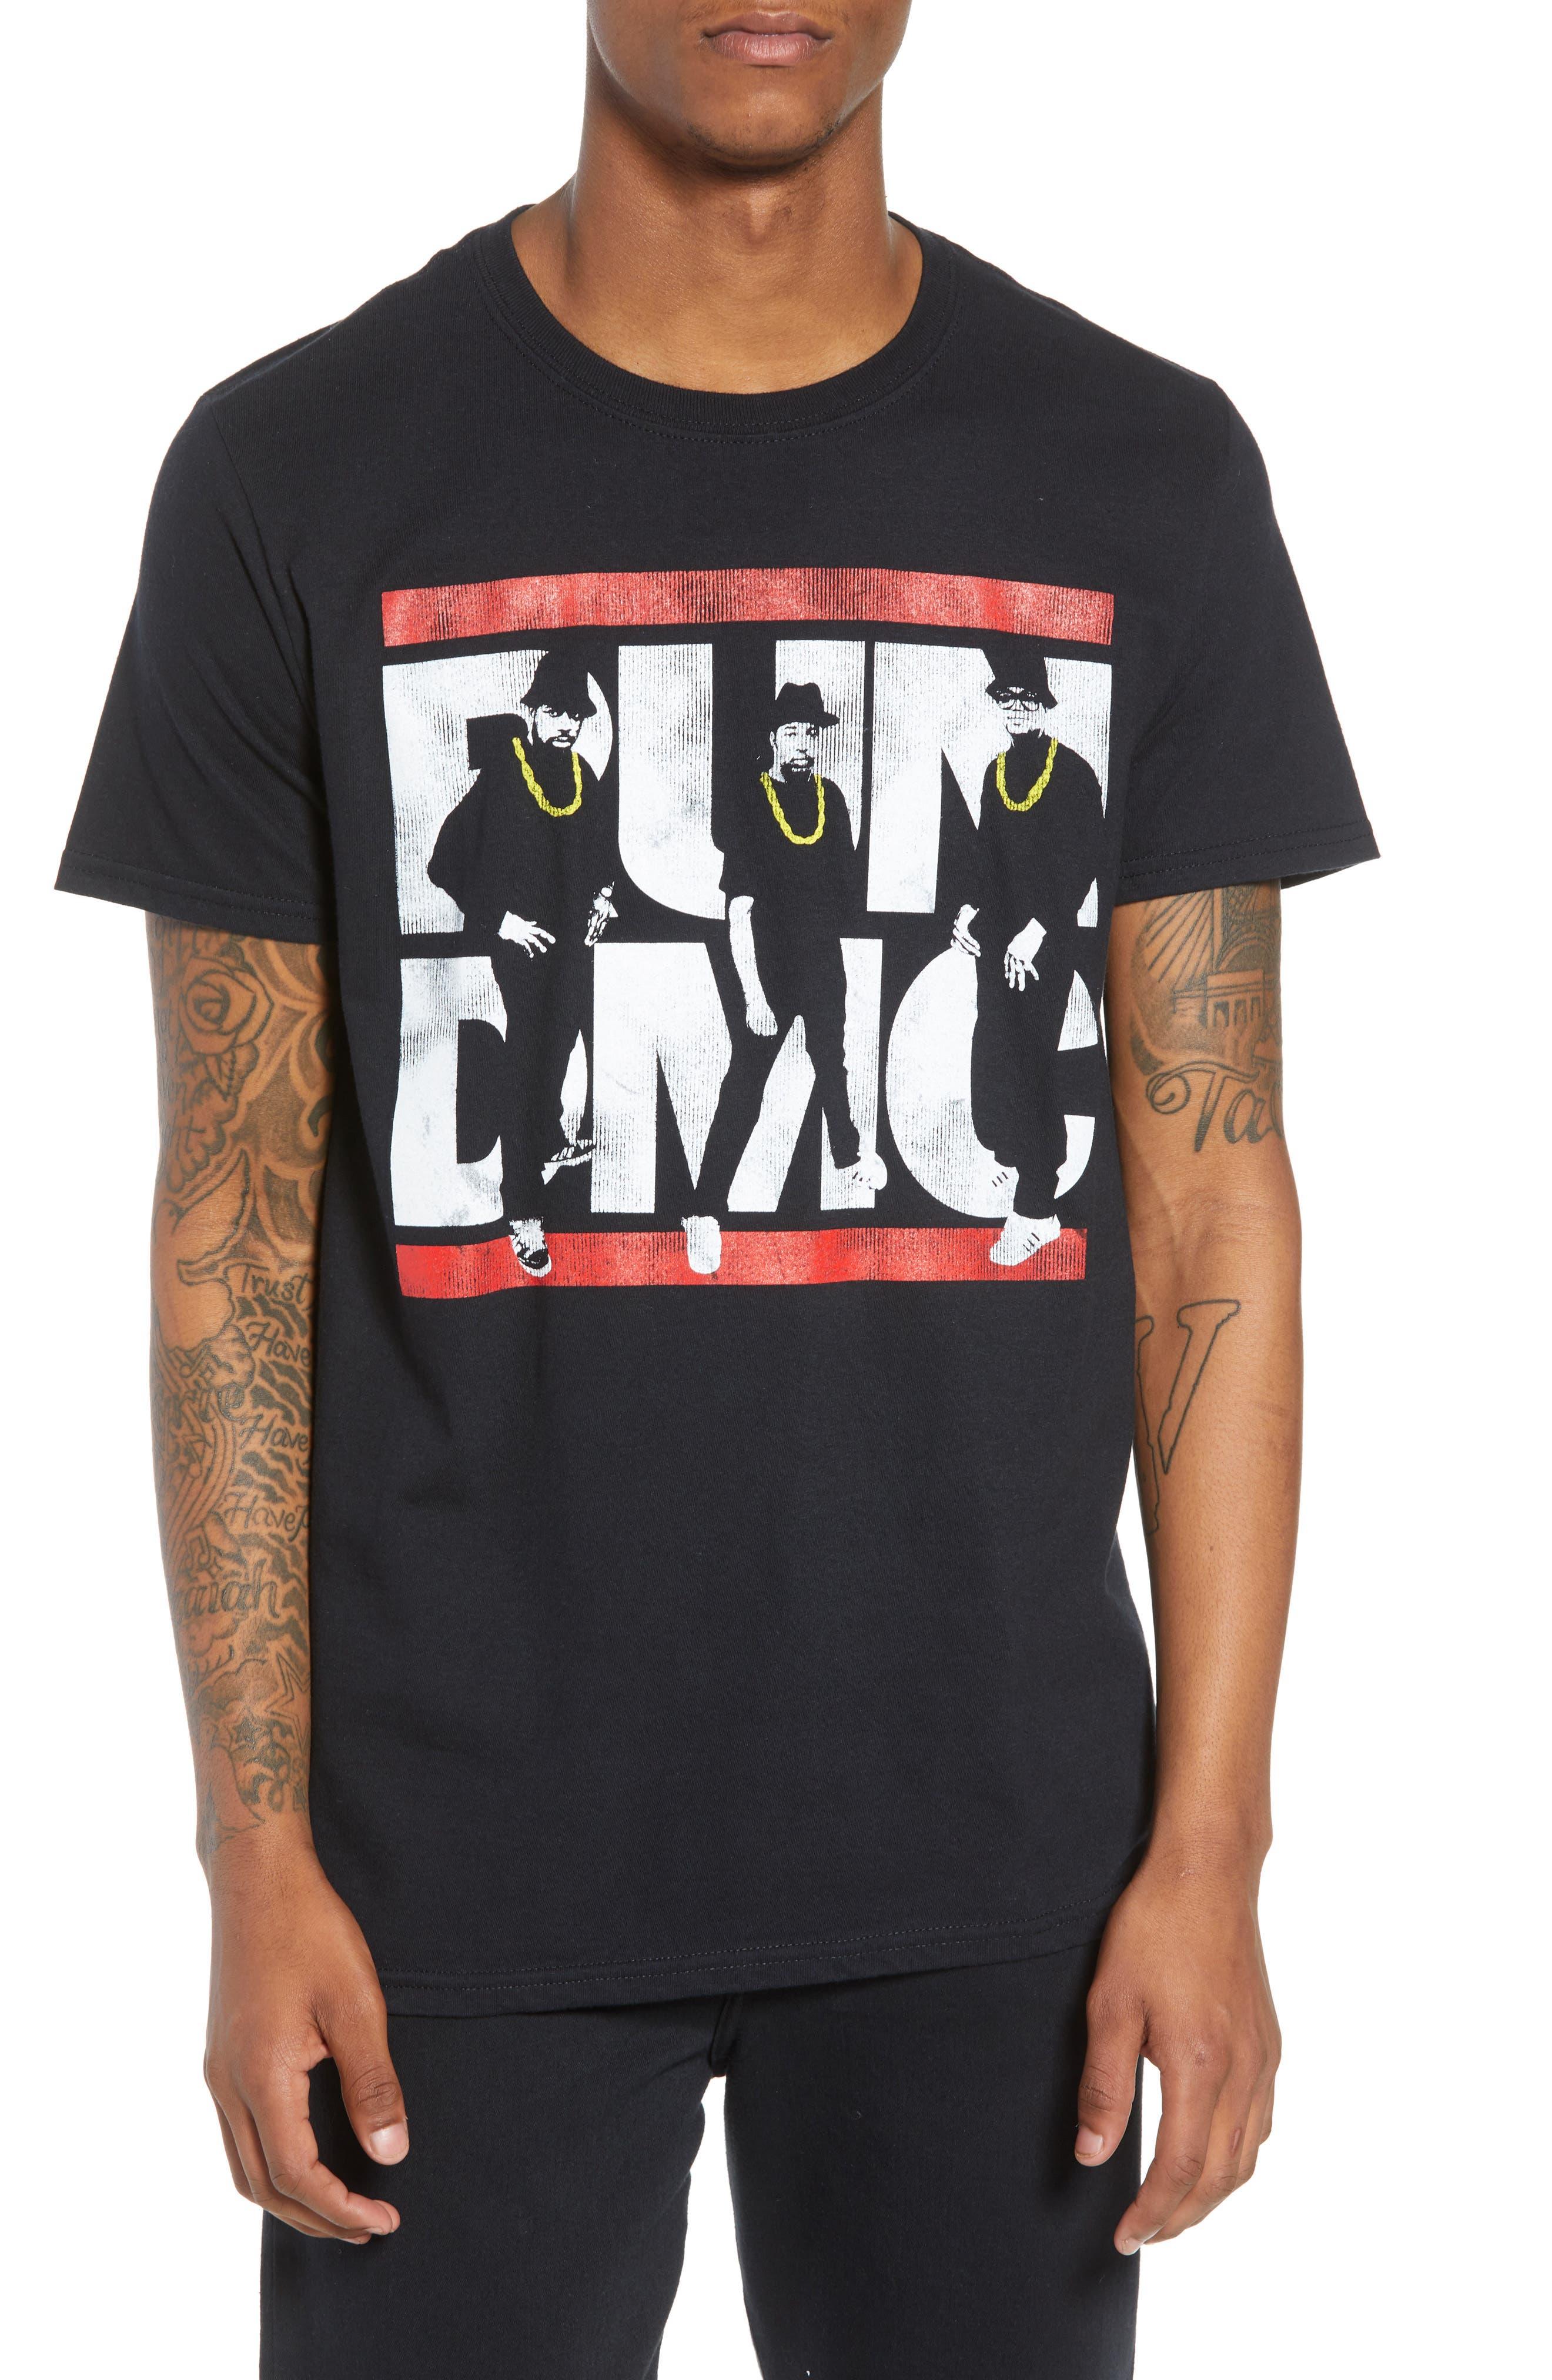 Run-DMC T-Shirt,                             Main thumbnail 1, color,                             Black Tee Run Dmc